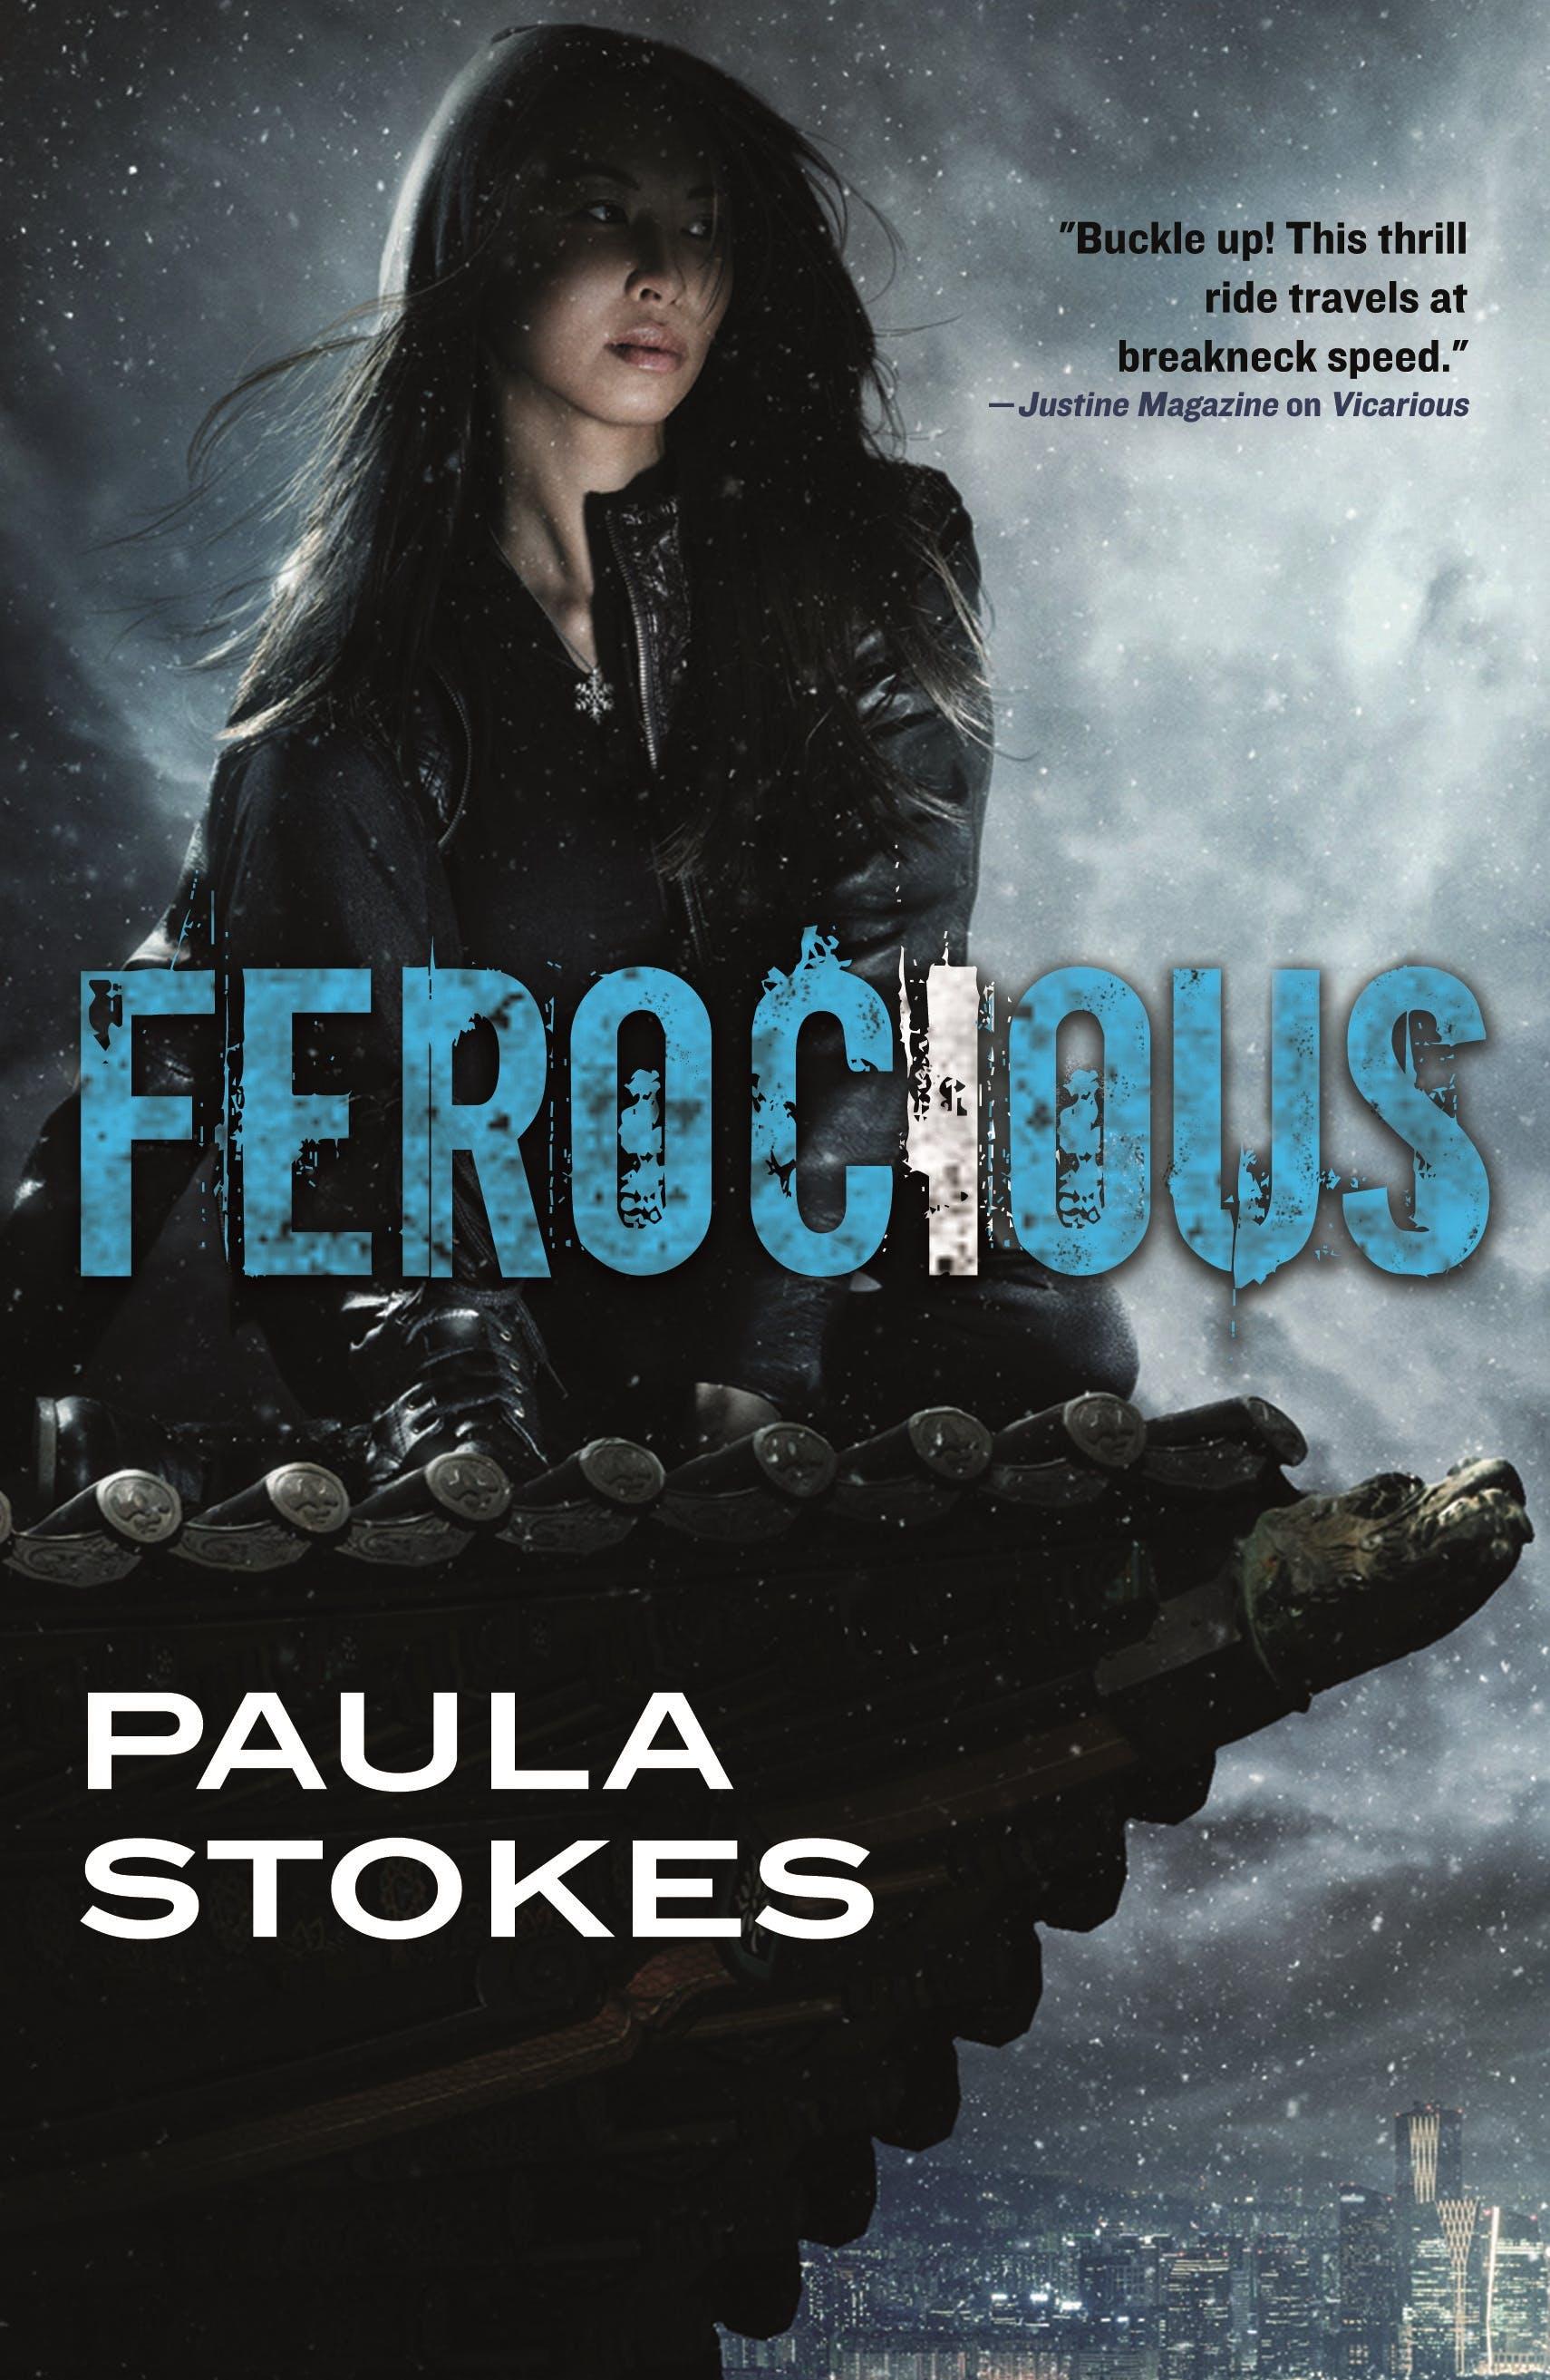 Image of Ferocious